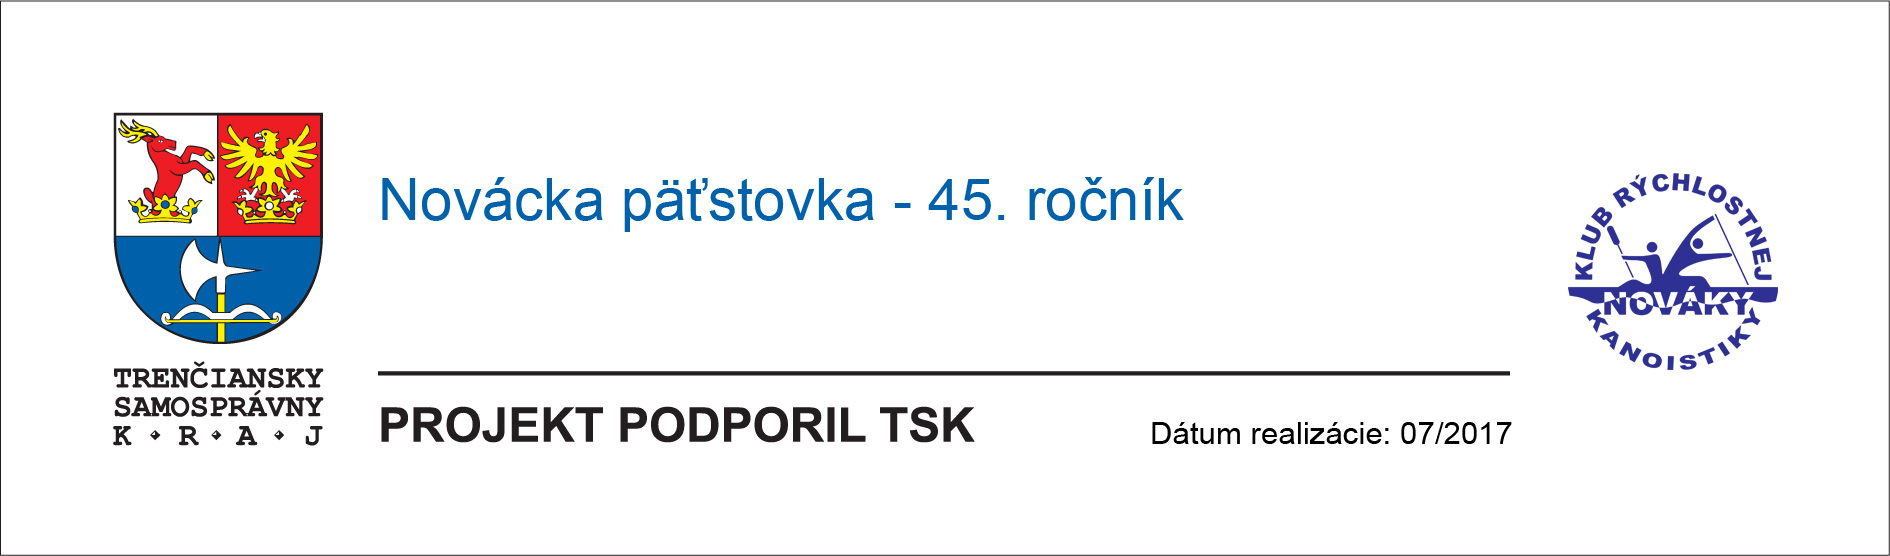 Novácka päťstovka - 45. ročník - projekt podporil Trenčiansky samosprávny kraj